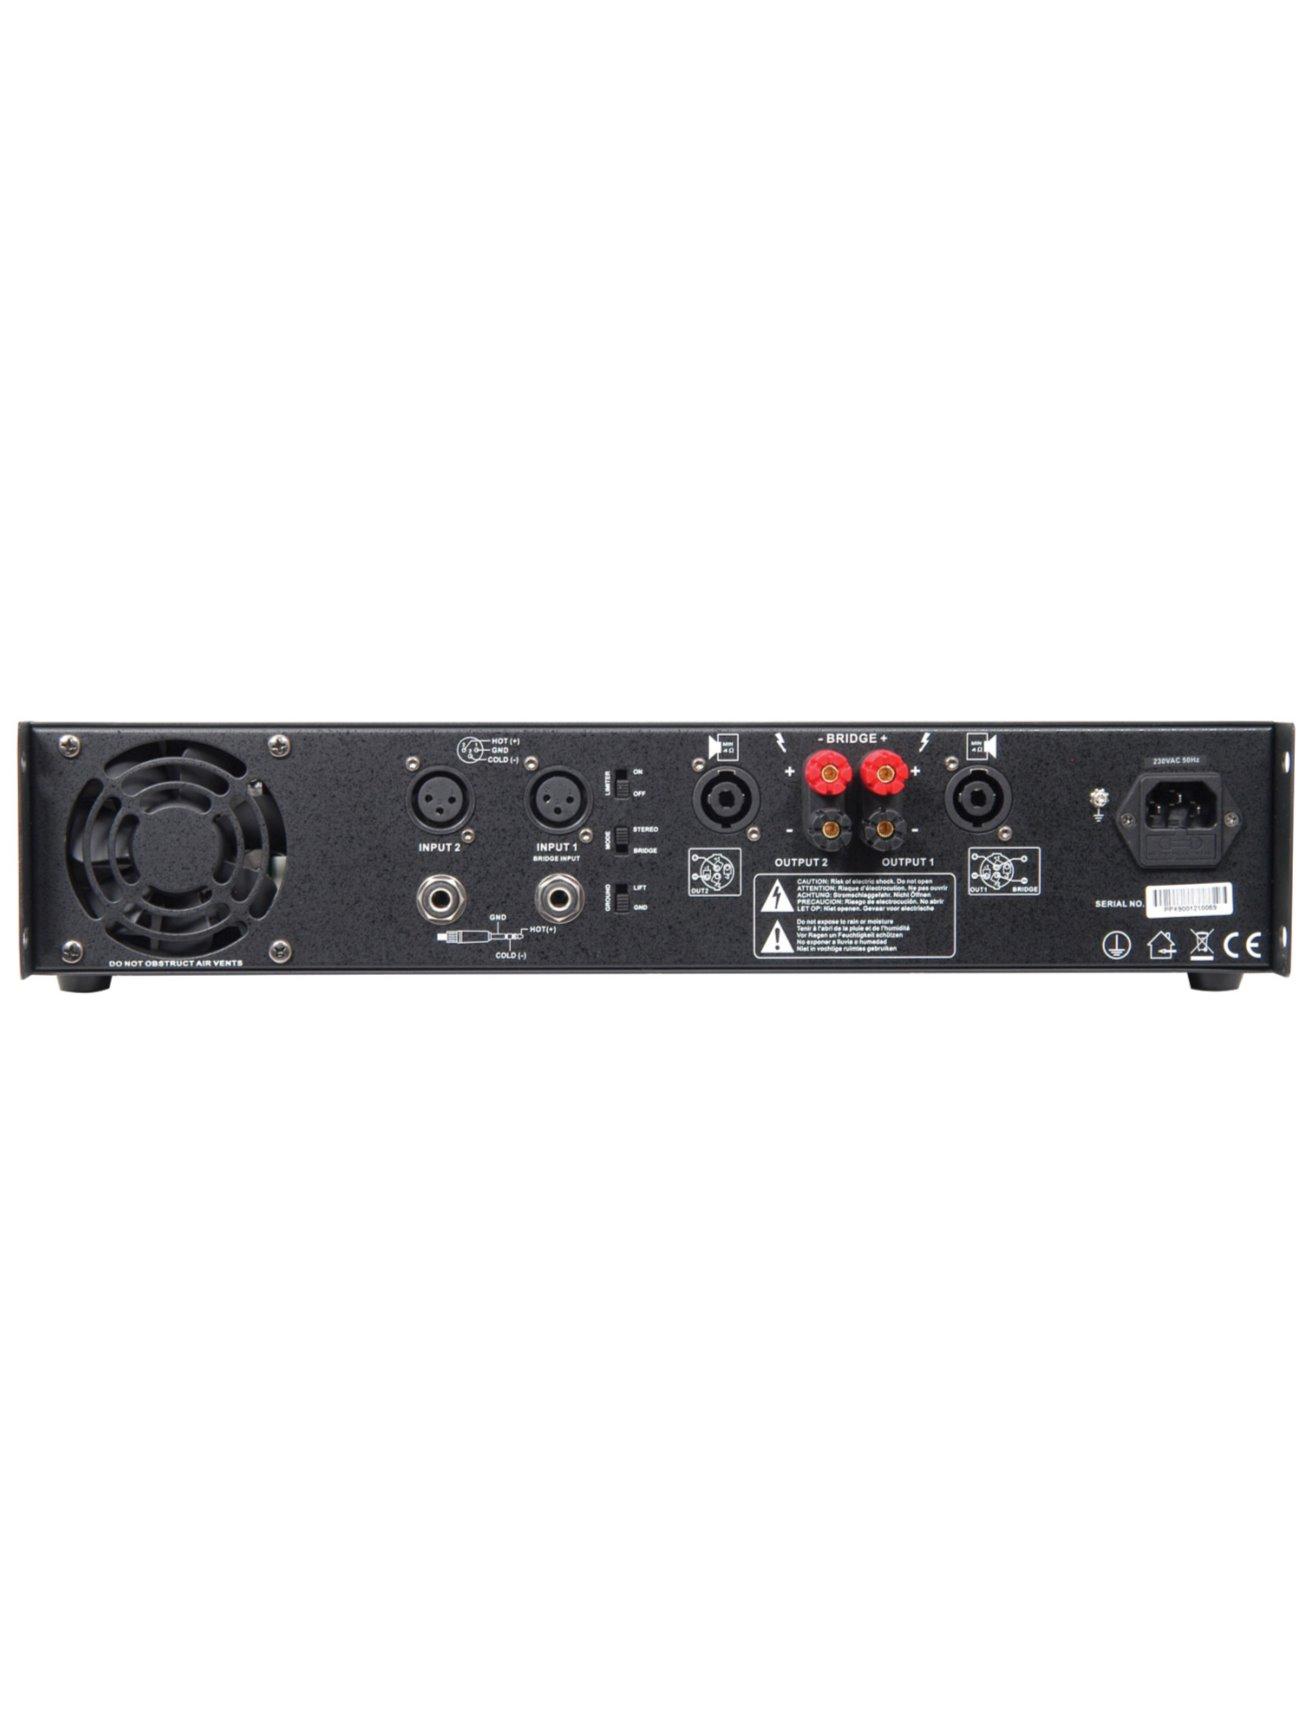 Citronic PPX900 Τελικός Ενισχυτής 2x450W 2U